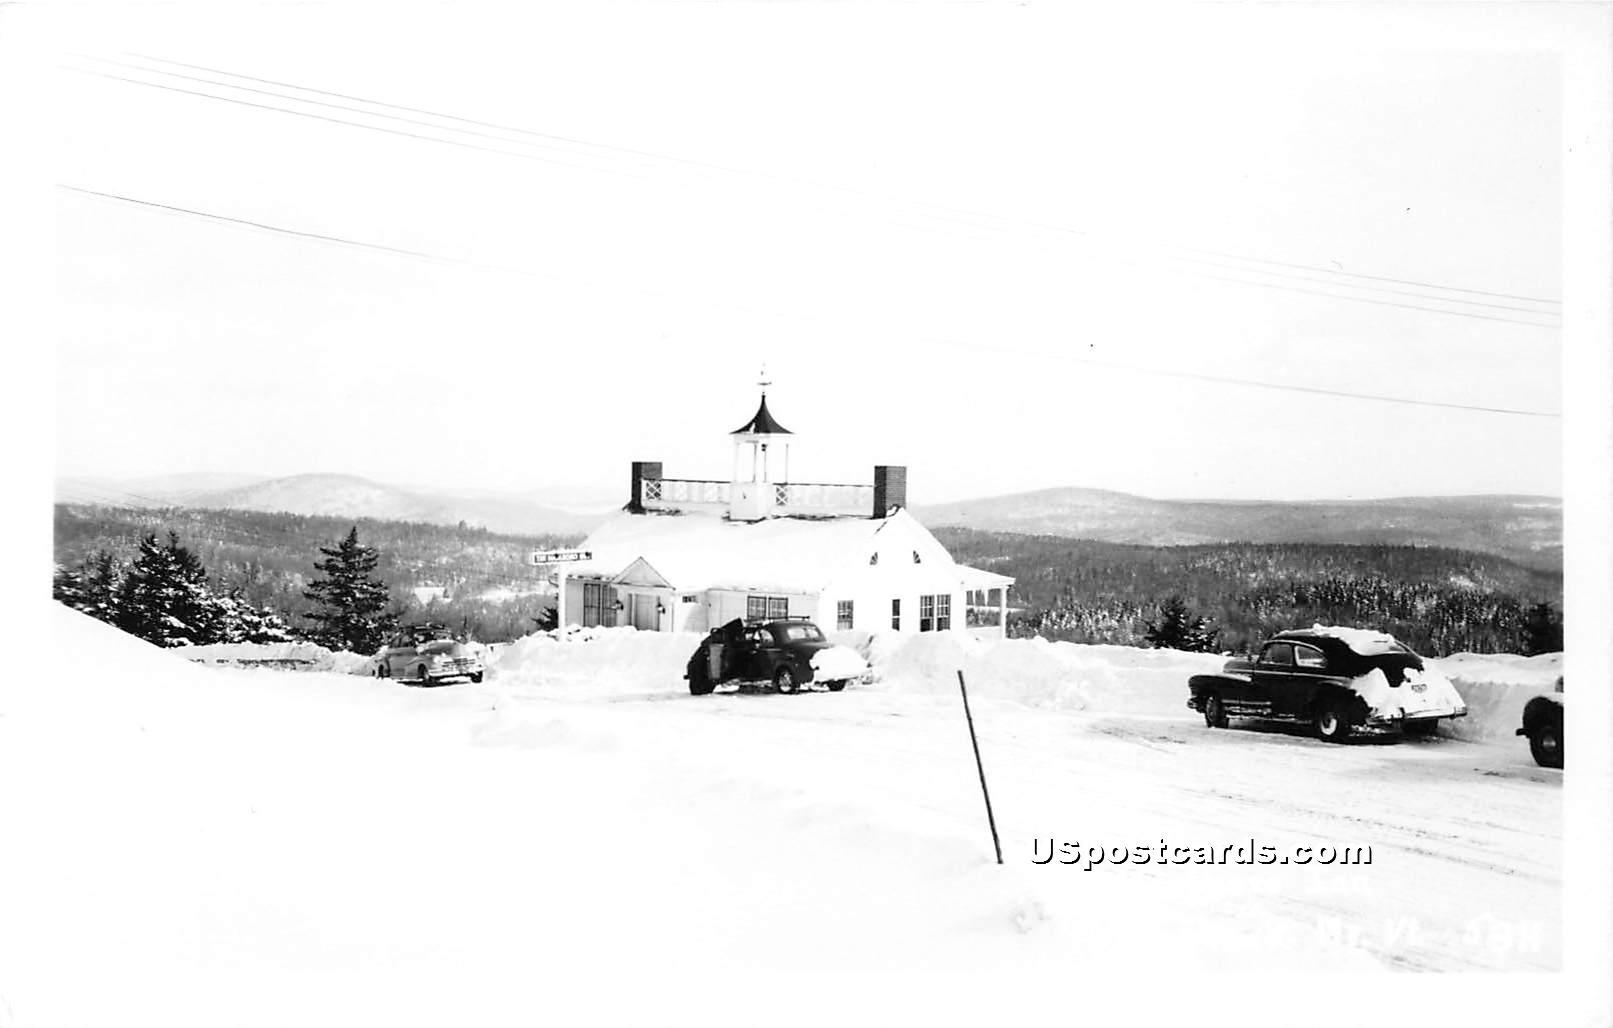 Marlboro Inn - Hogback Mountain, Vermont VT Postcard